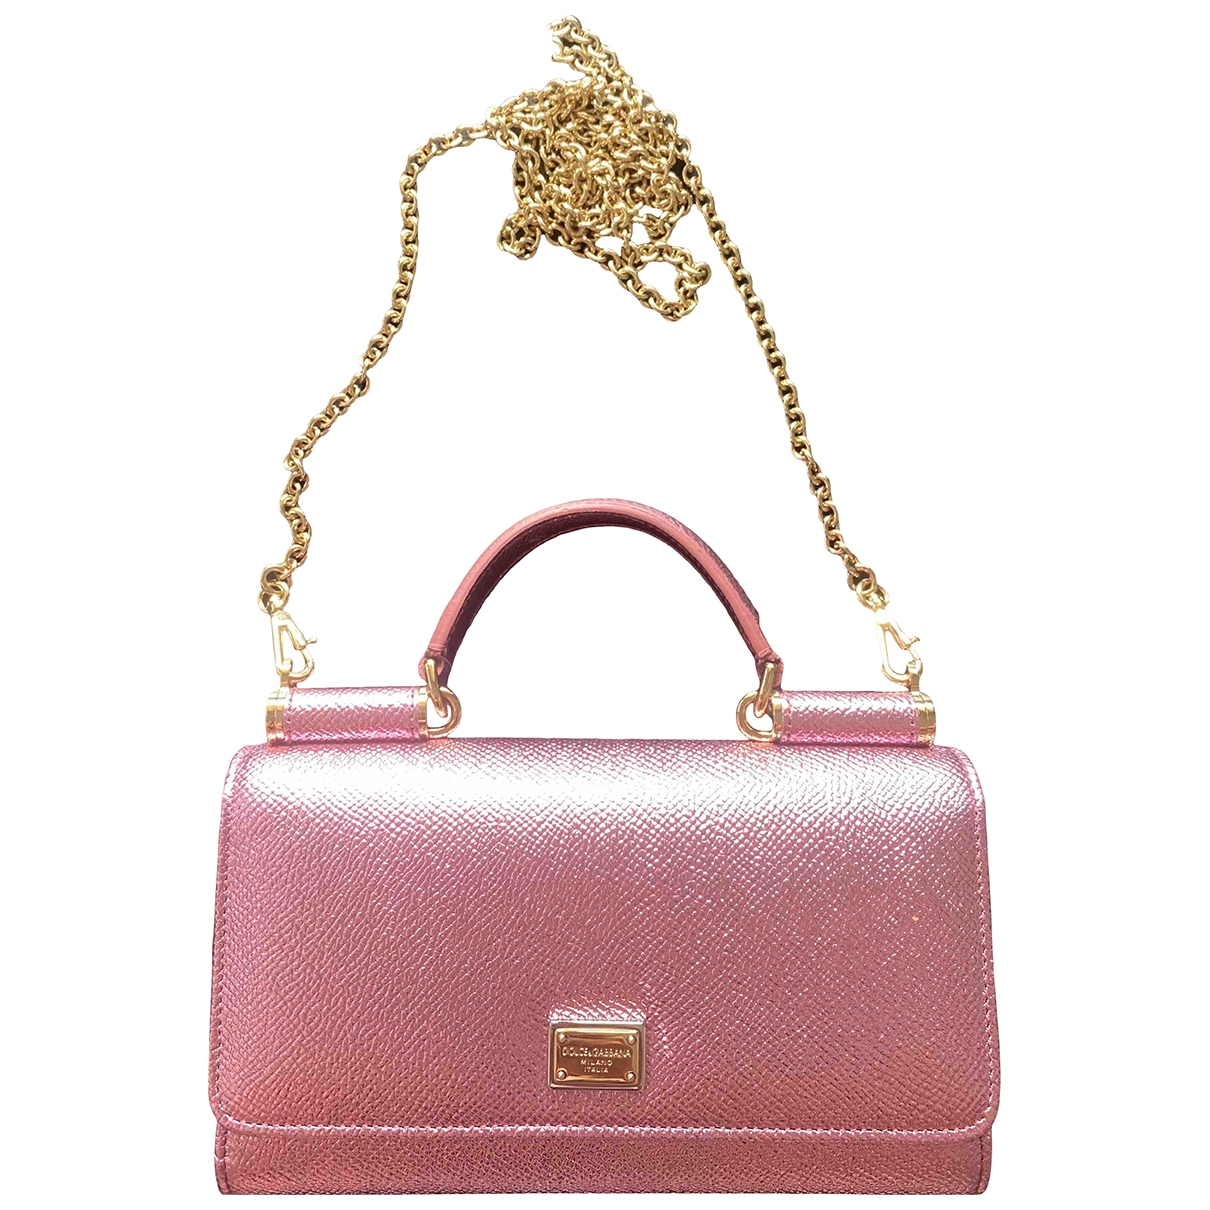 Dolce & Gabbana - Sac a main Sicily pour femme en cuir - rose